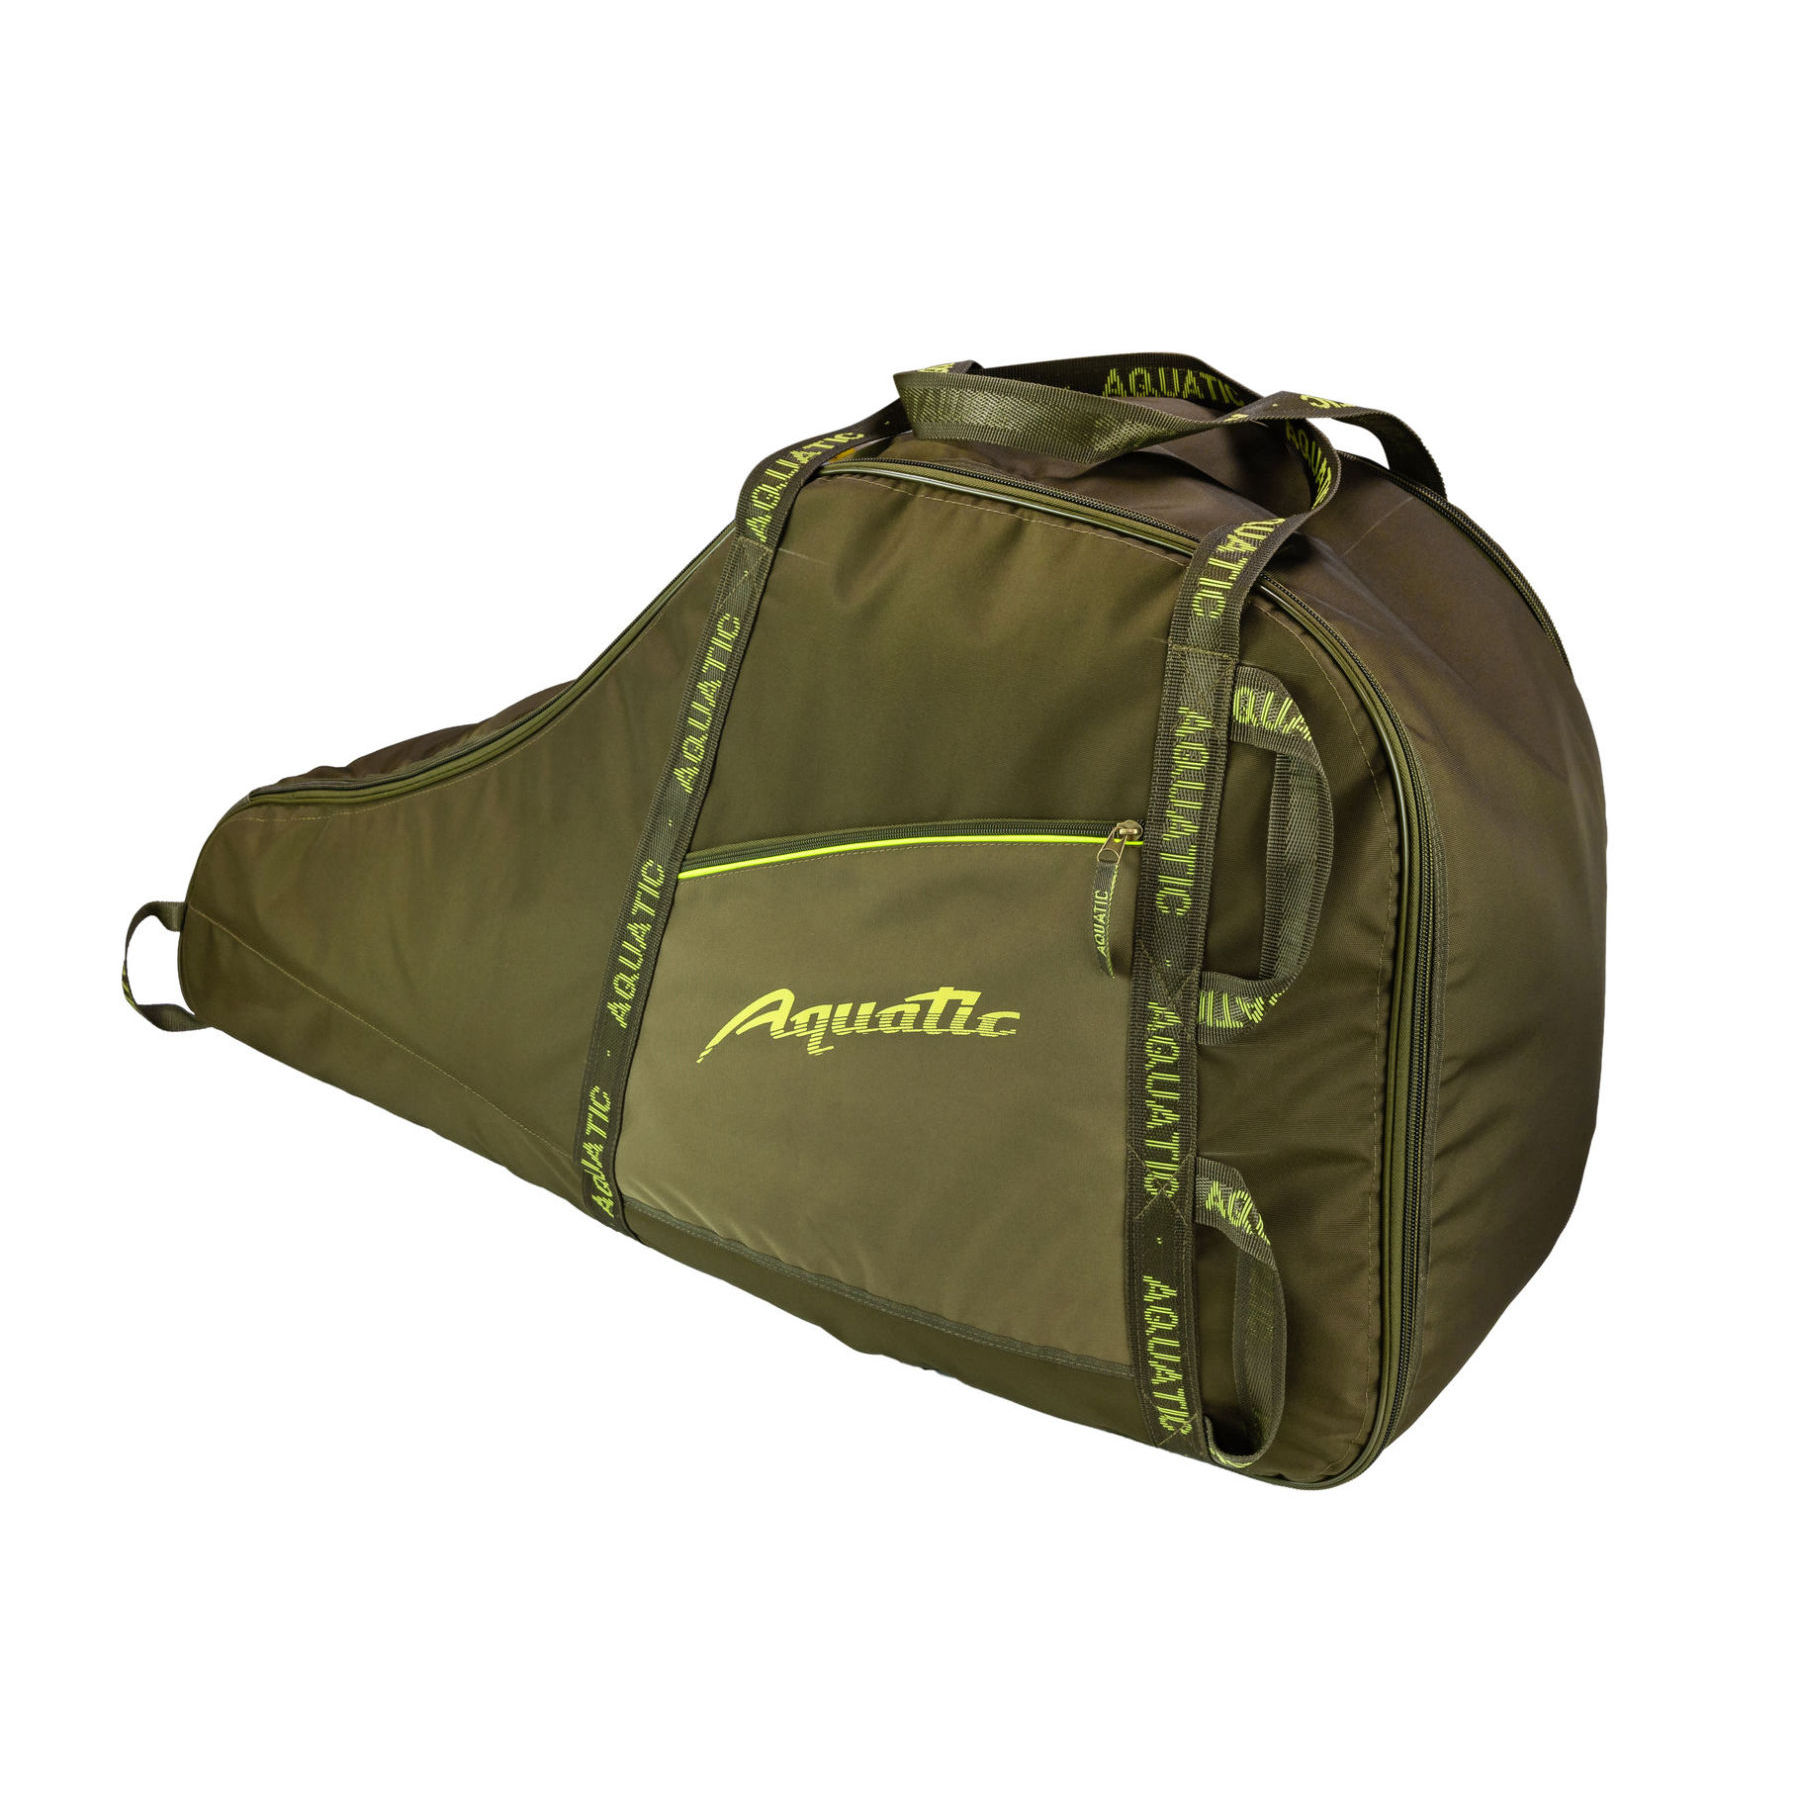 Bag For Storage And Motor 2 T 10-15 Hp 4 T 6-8 Hp. Aquatic ЧМ-13Х, ЧМ-13Х